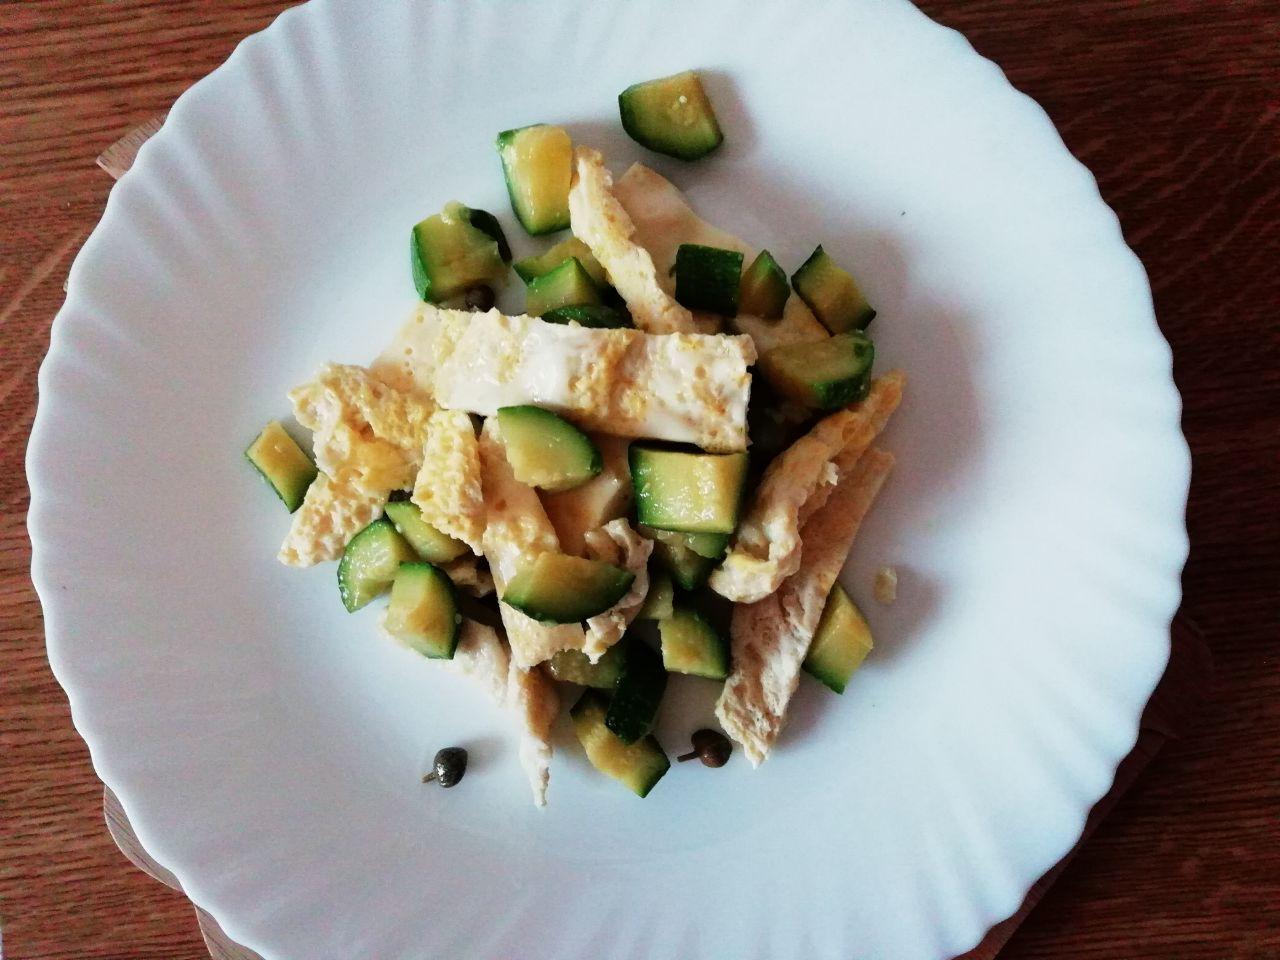 Piatti leggeri: tagliatelle di frittata alle zucchine!